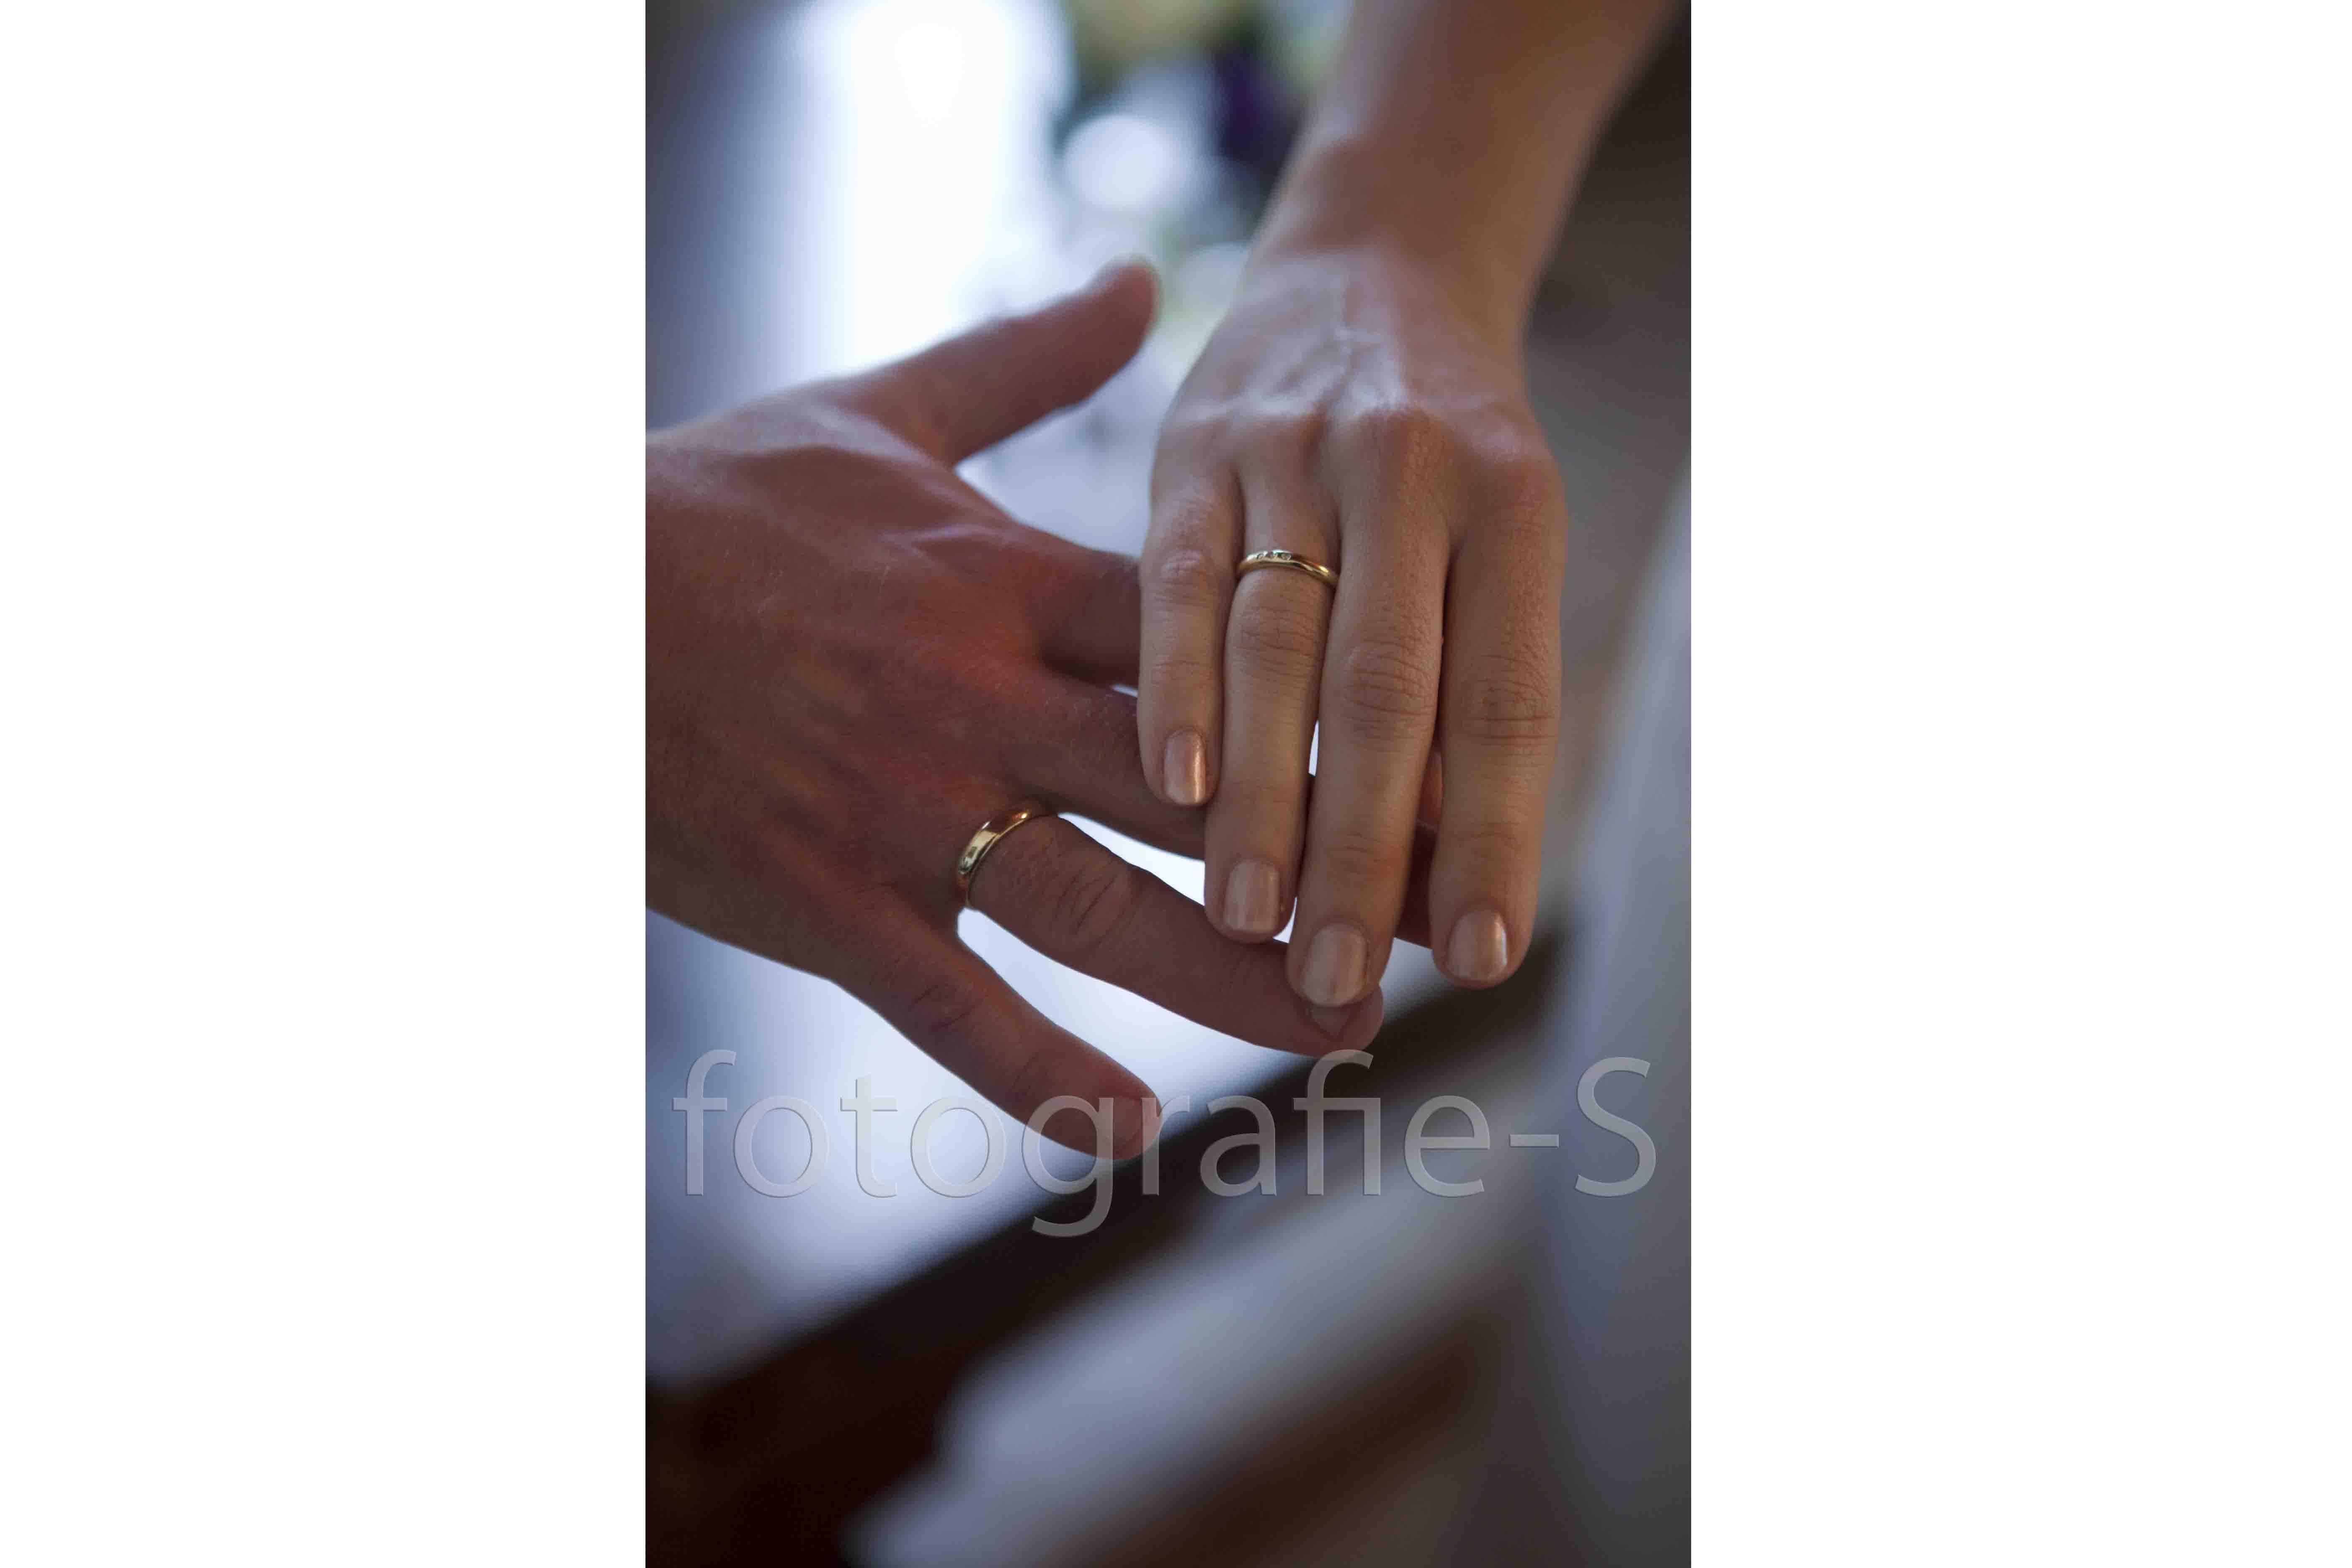 Fotografie bruiloft